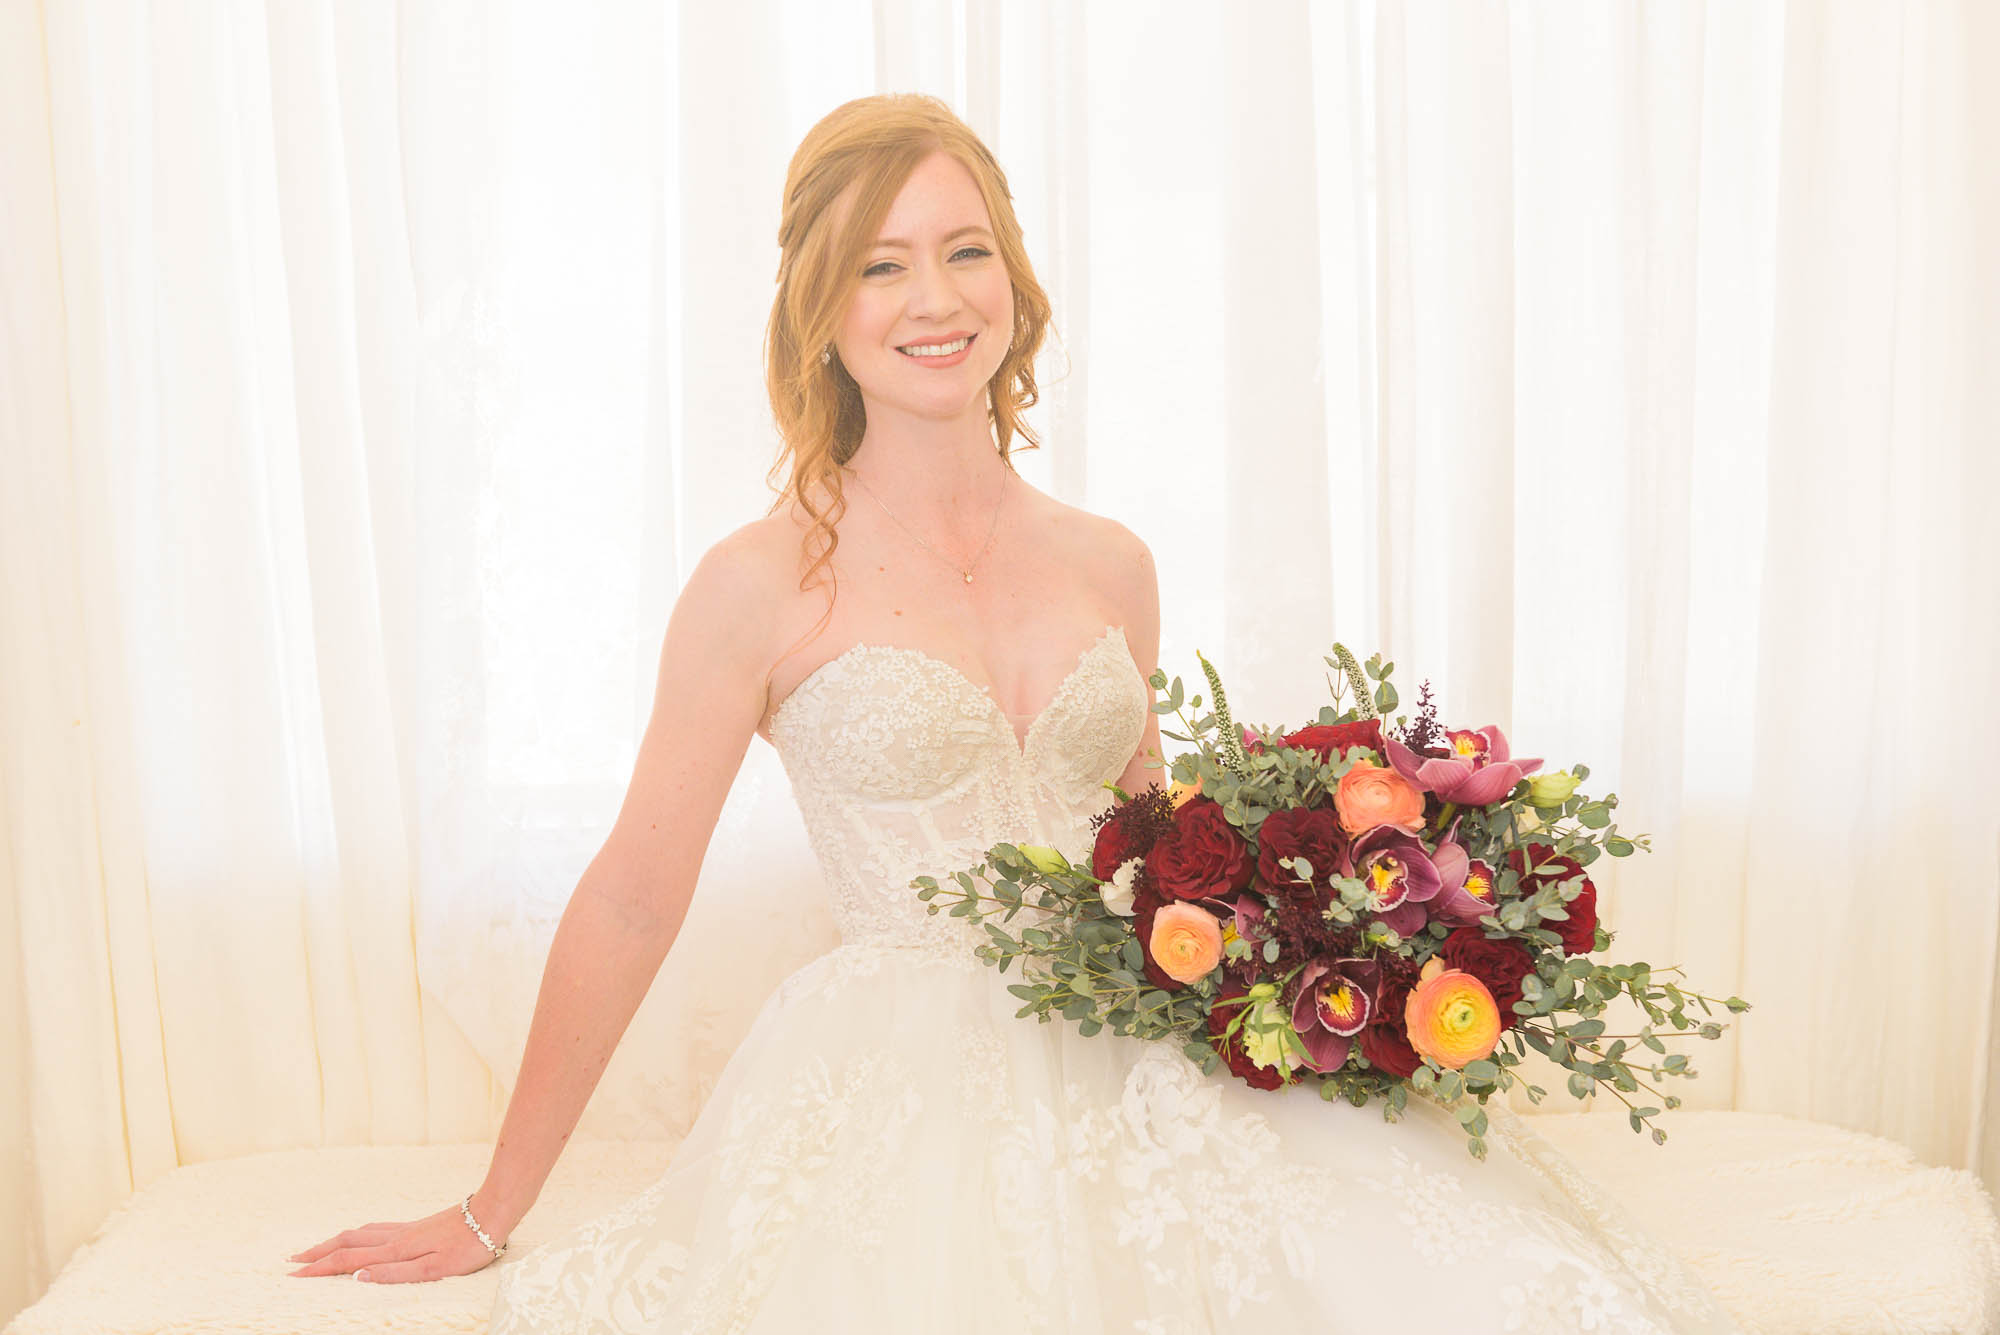 055_Alan_and_Heidi_Serendipity_Garden_Wedding_10-27-2018